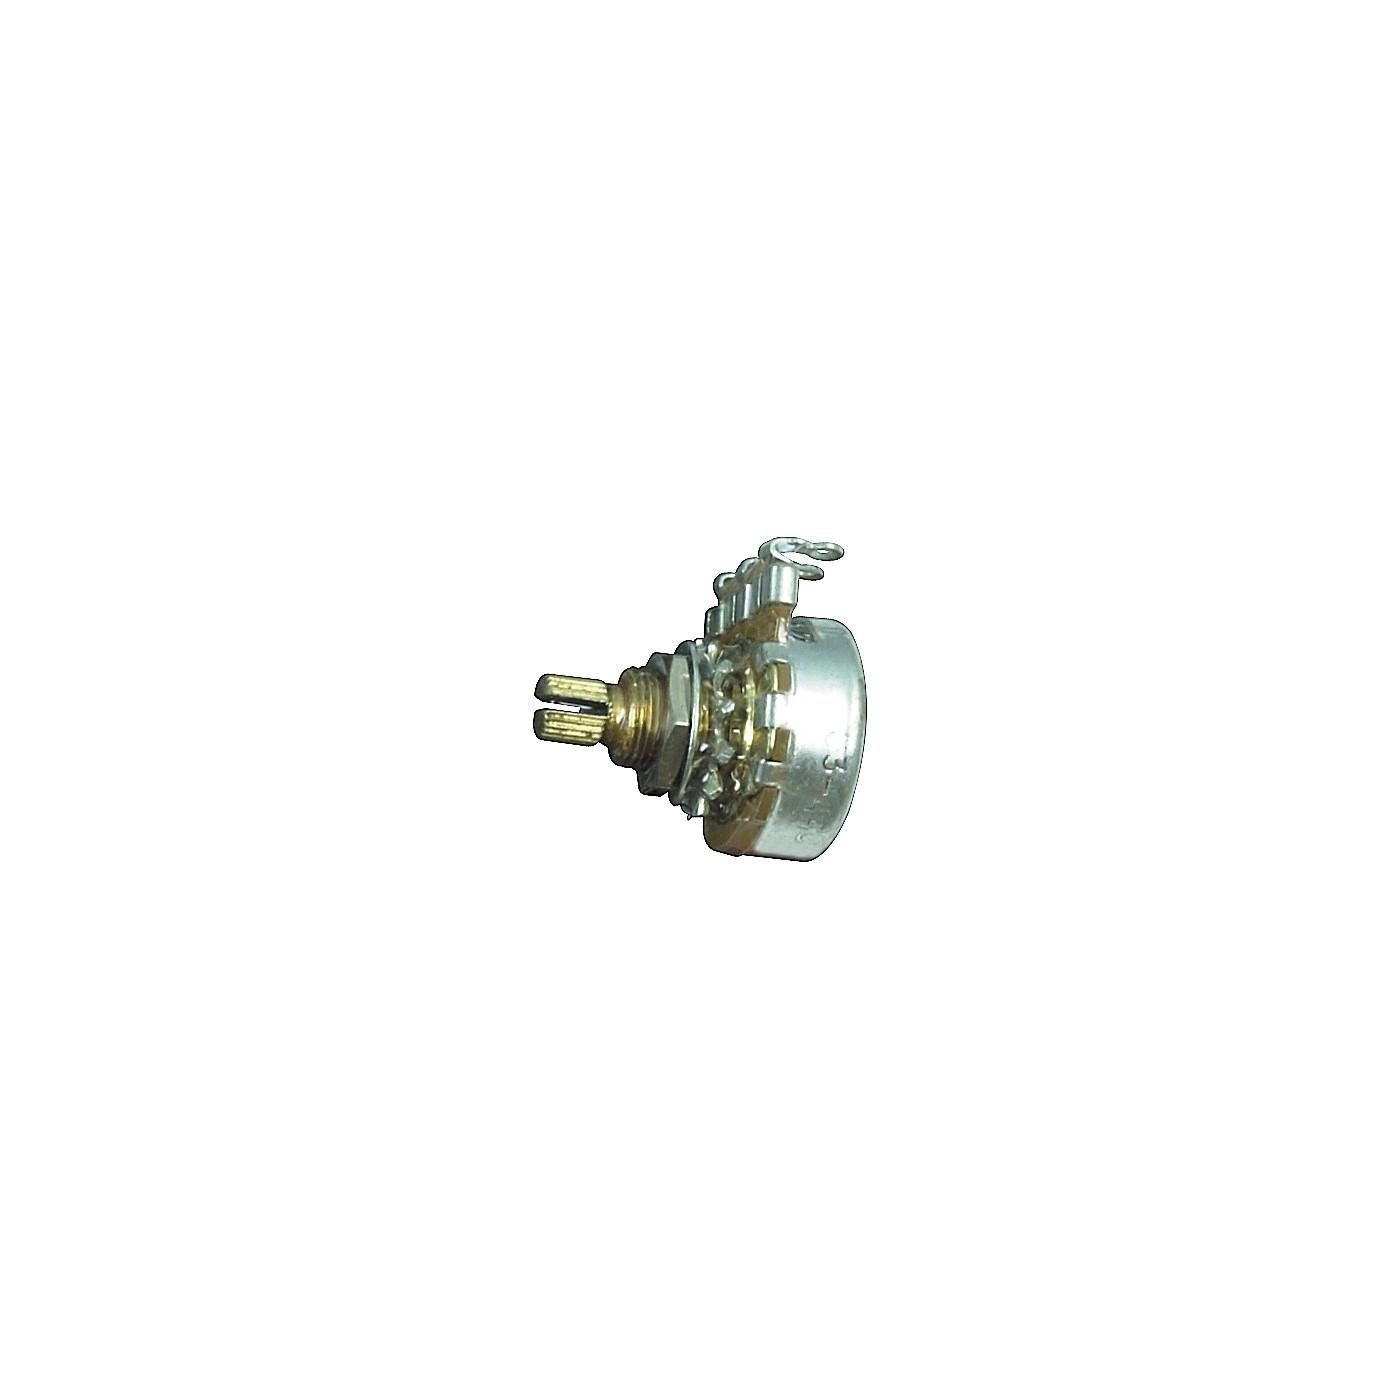 Gibson 500kOhm Potentiometer Audio Taper/Short Shaft thumbnail